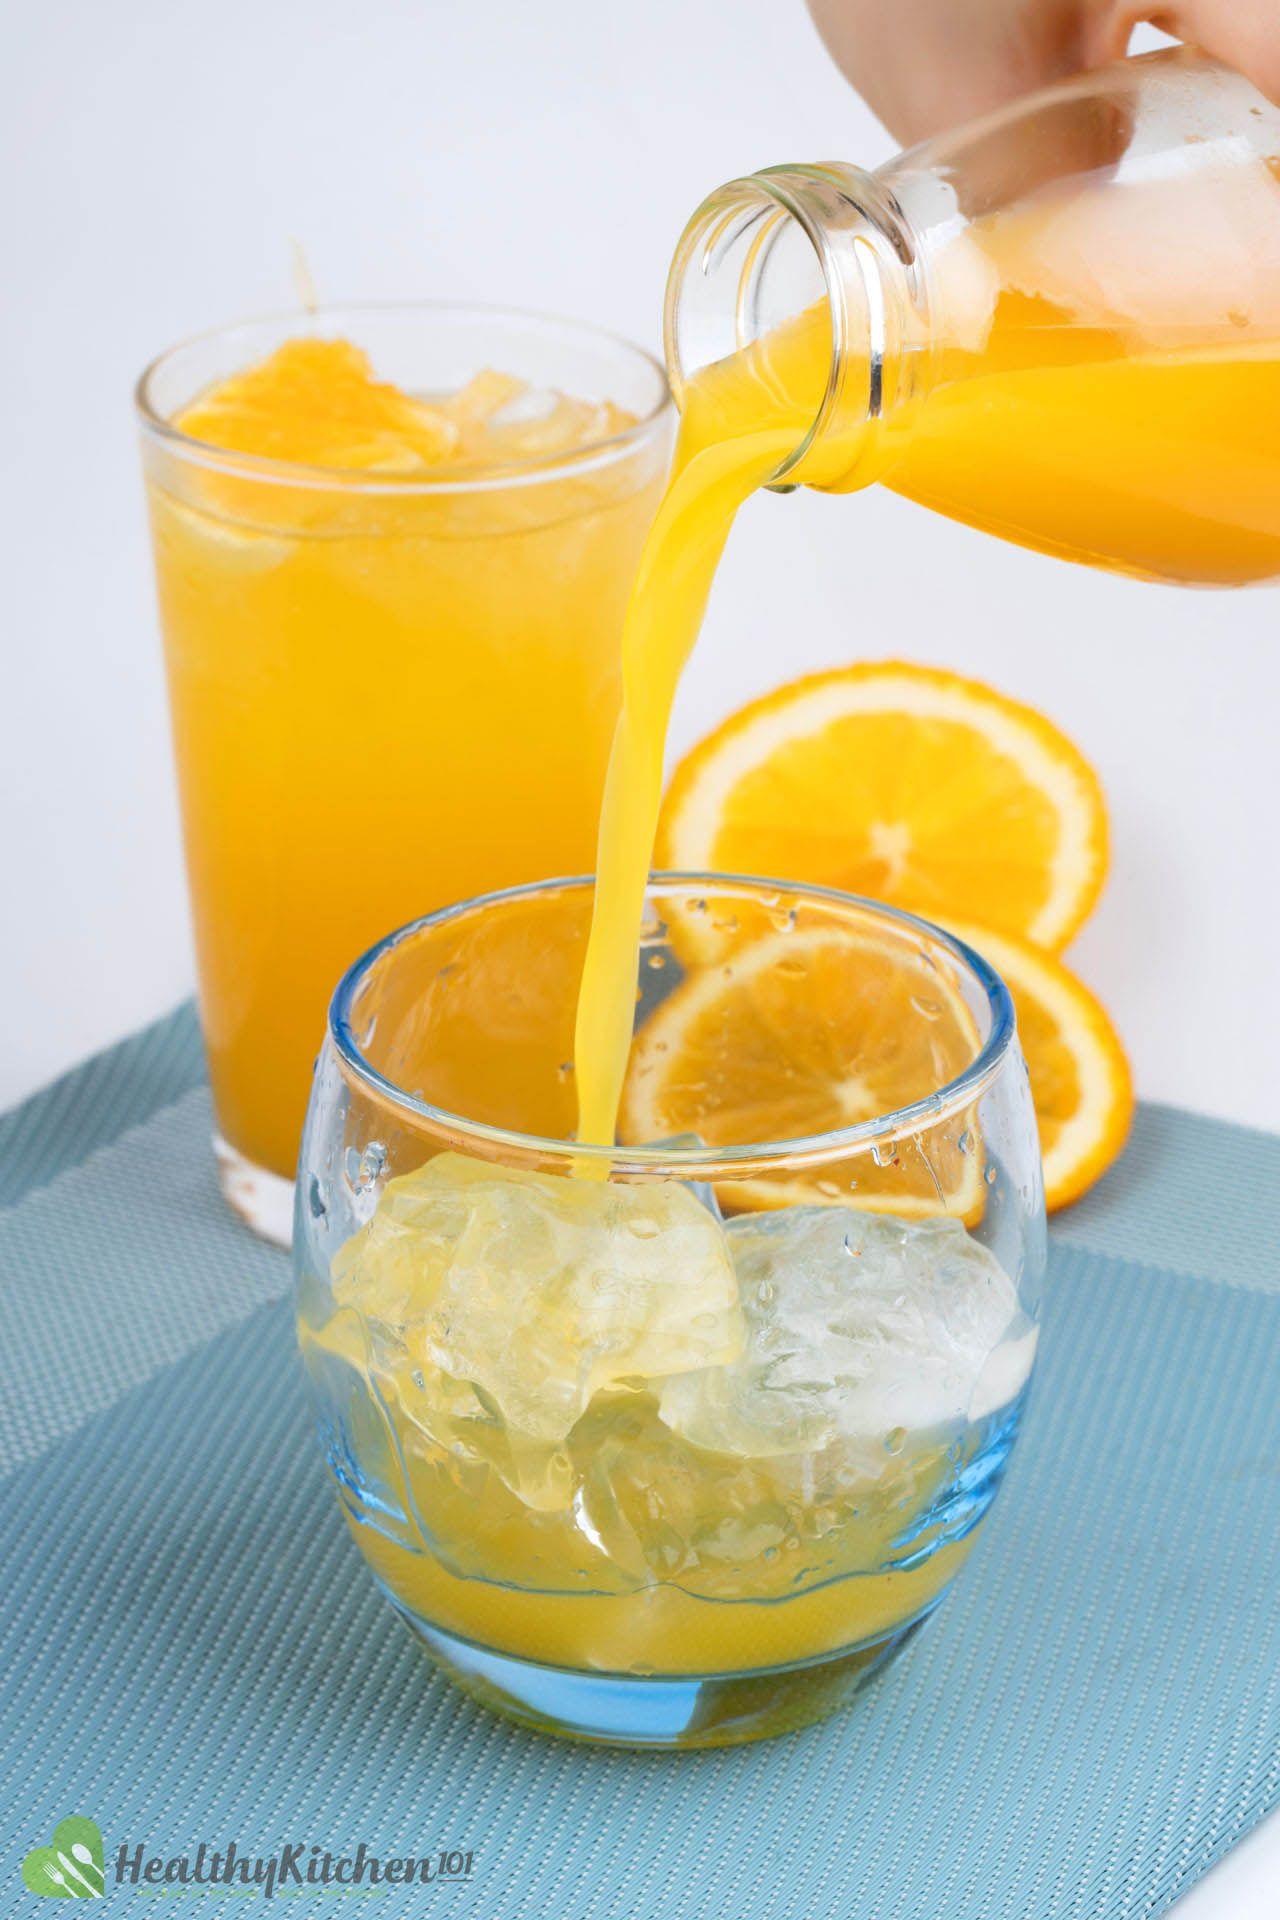 Orange Pinapple Juice Healthykitchen101 2